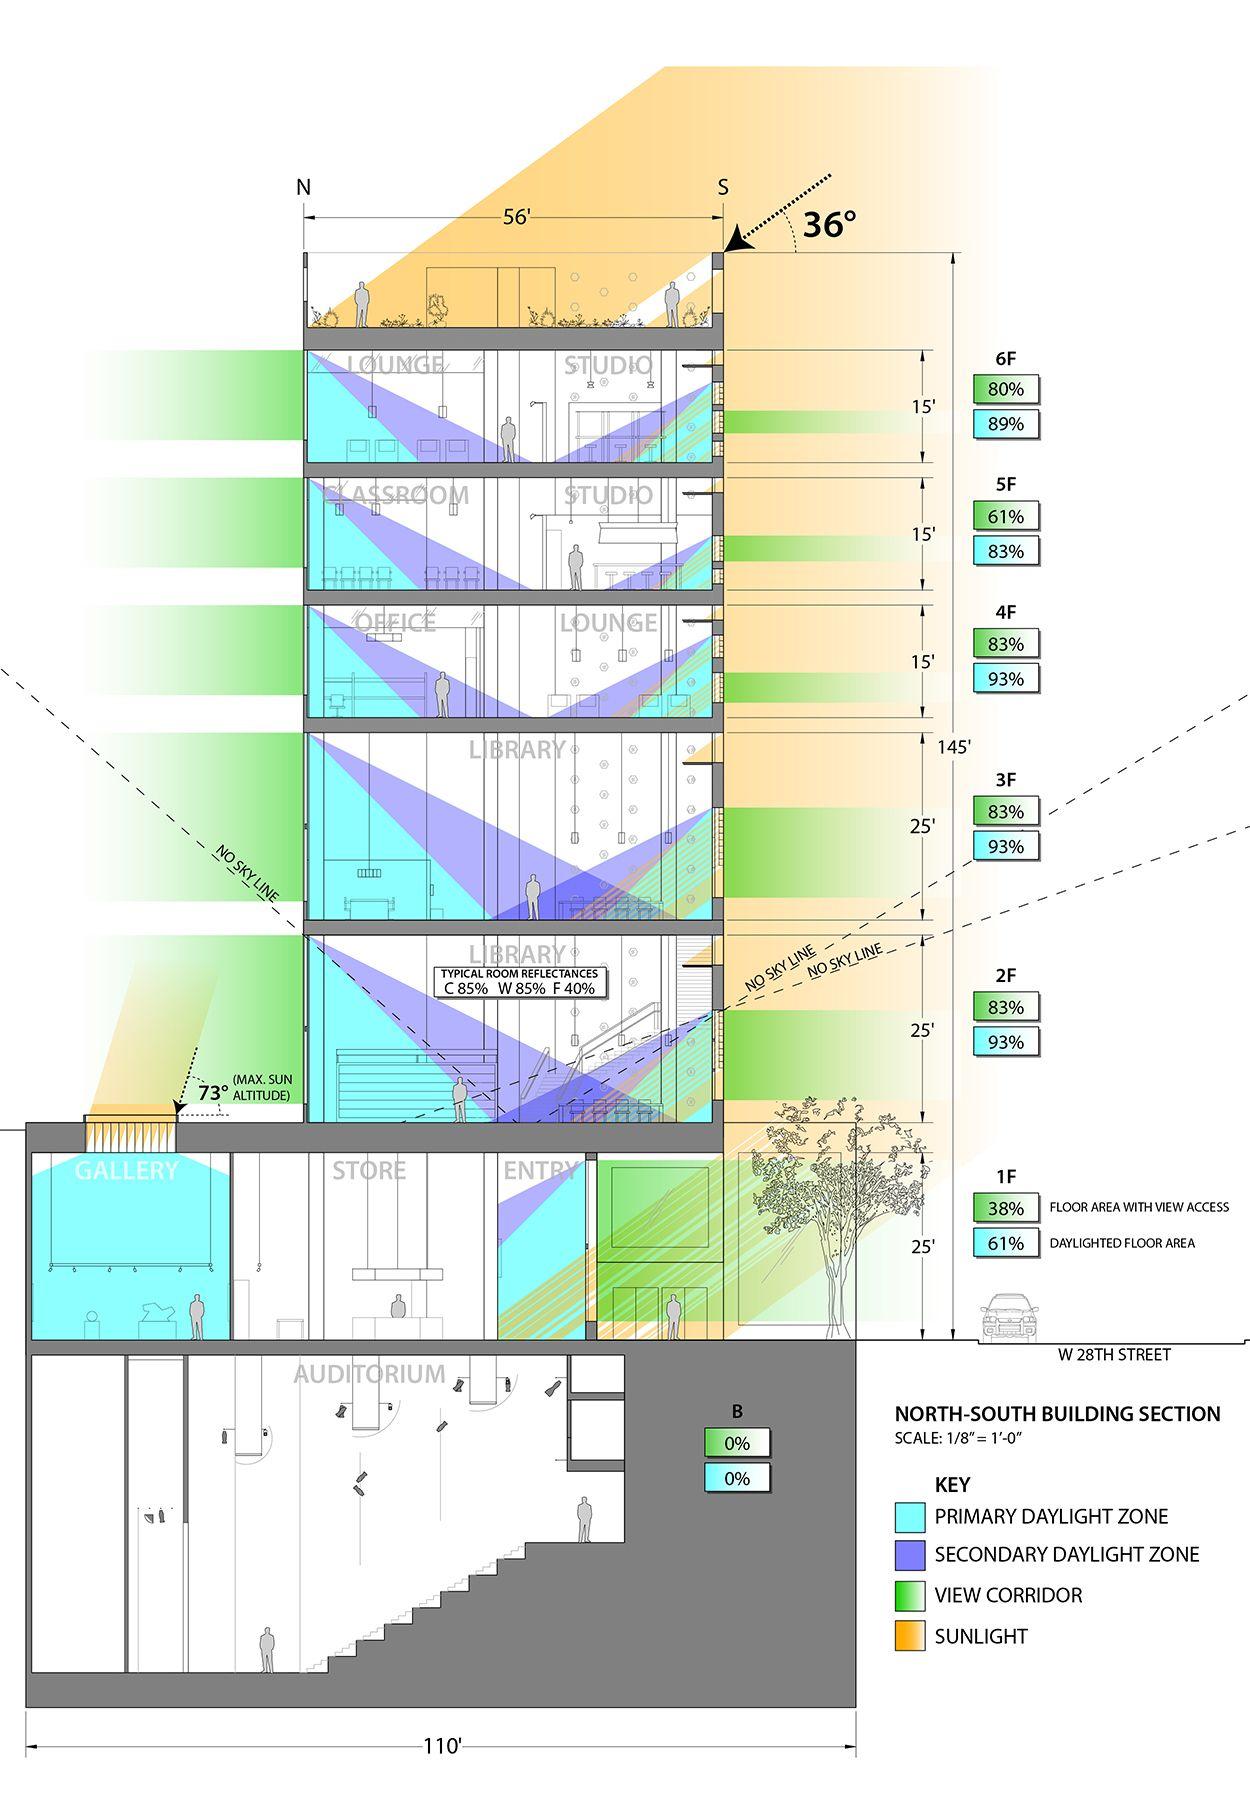 architecture section diagram john deere la105 wiring a lighting design for 24 7 student center